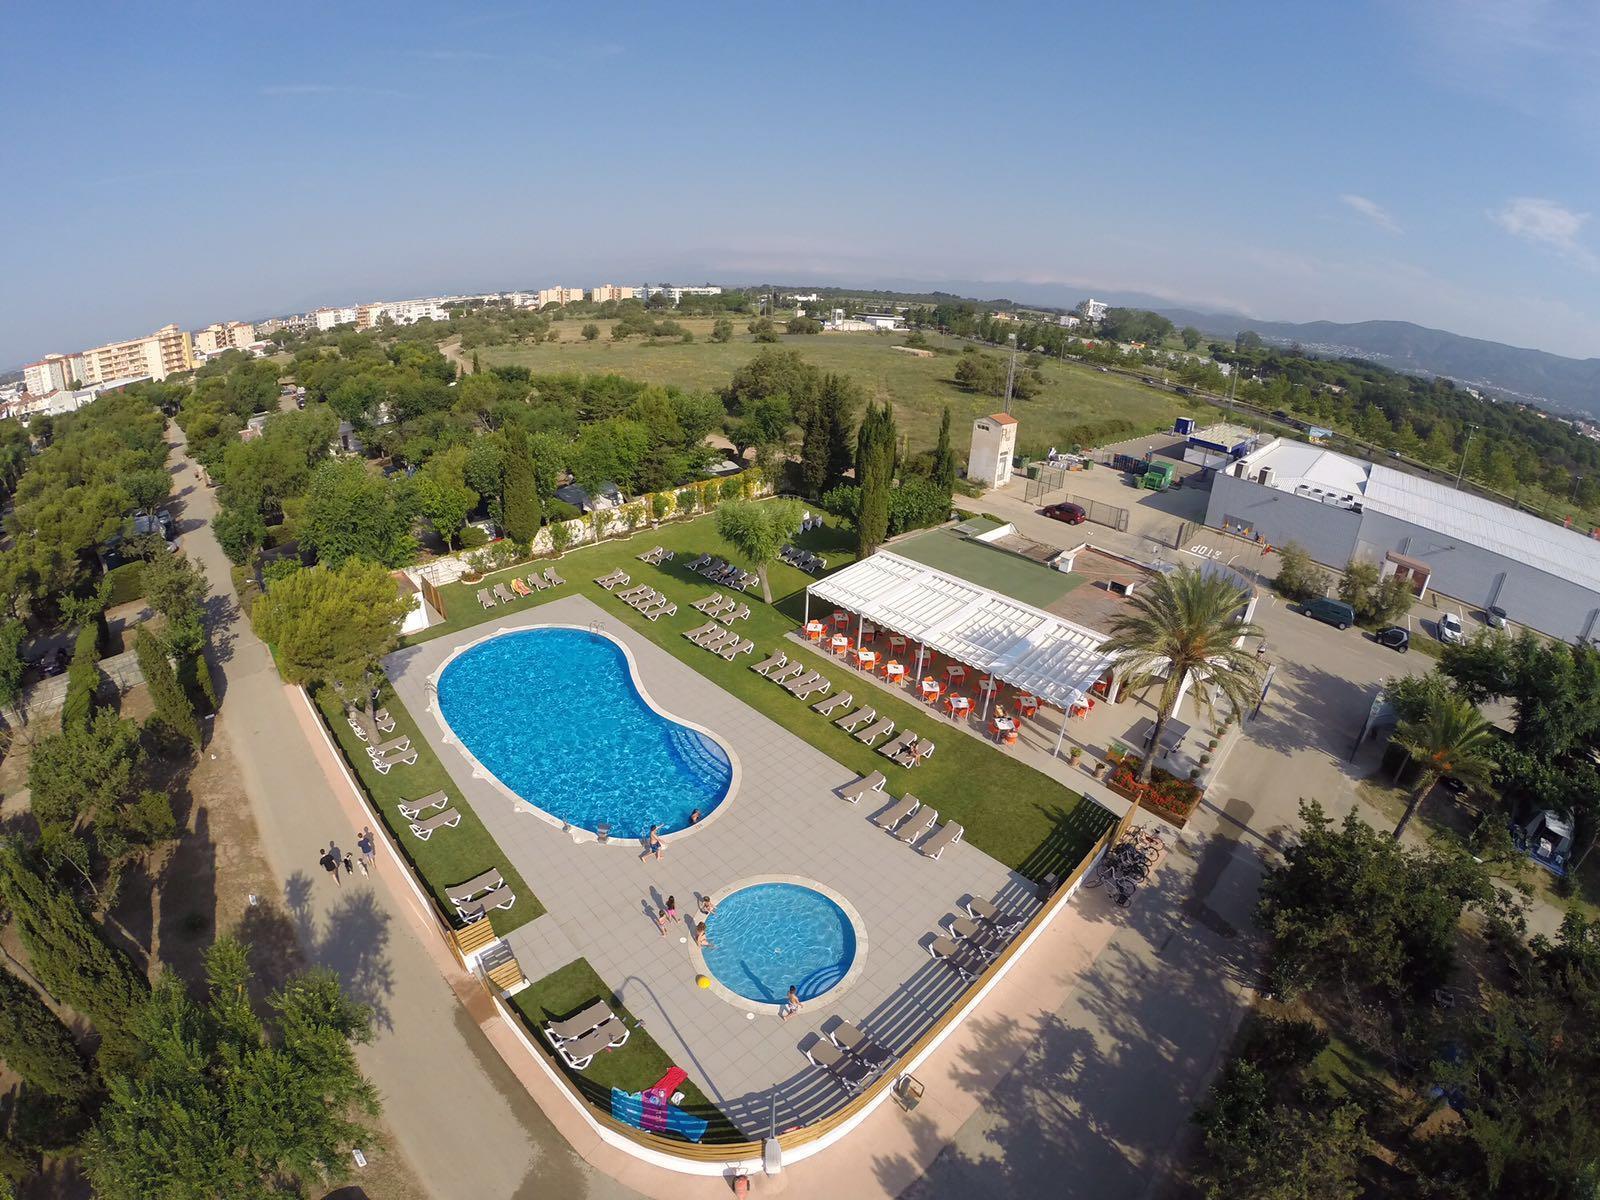 Spanje-Roses-Camping%20Rodas-ExtraLarge Campings Spanje